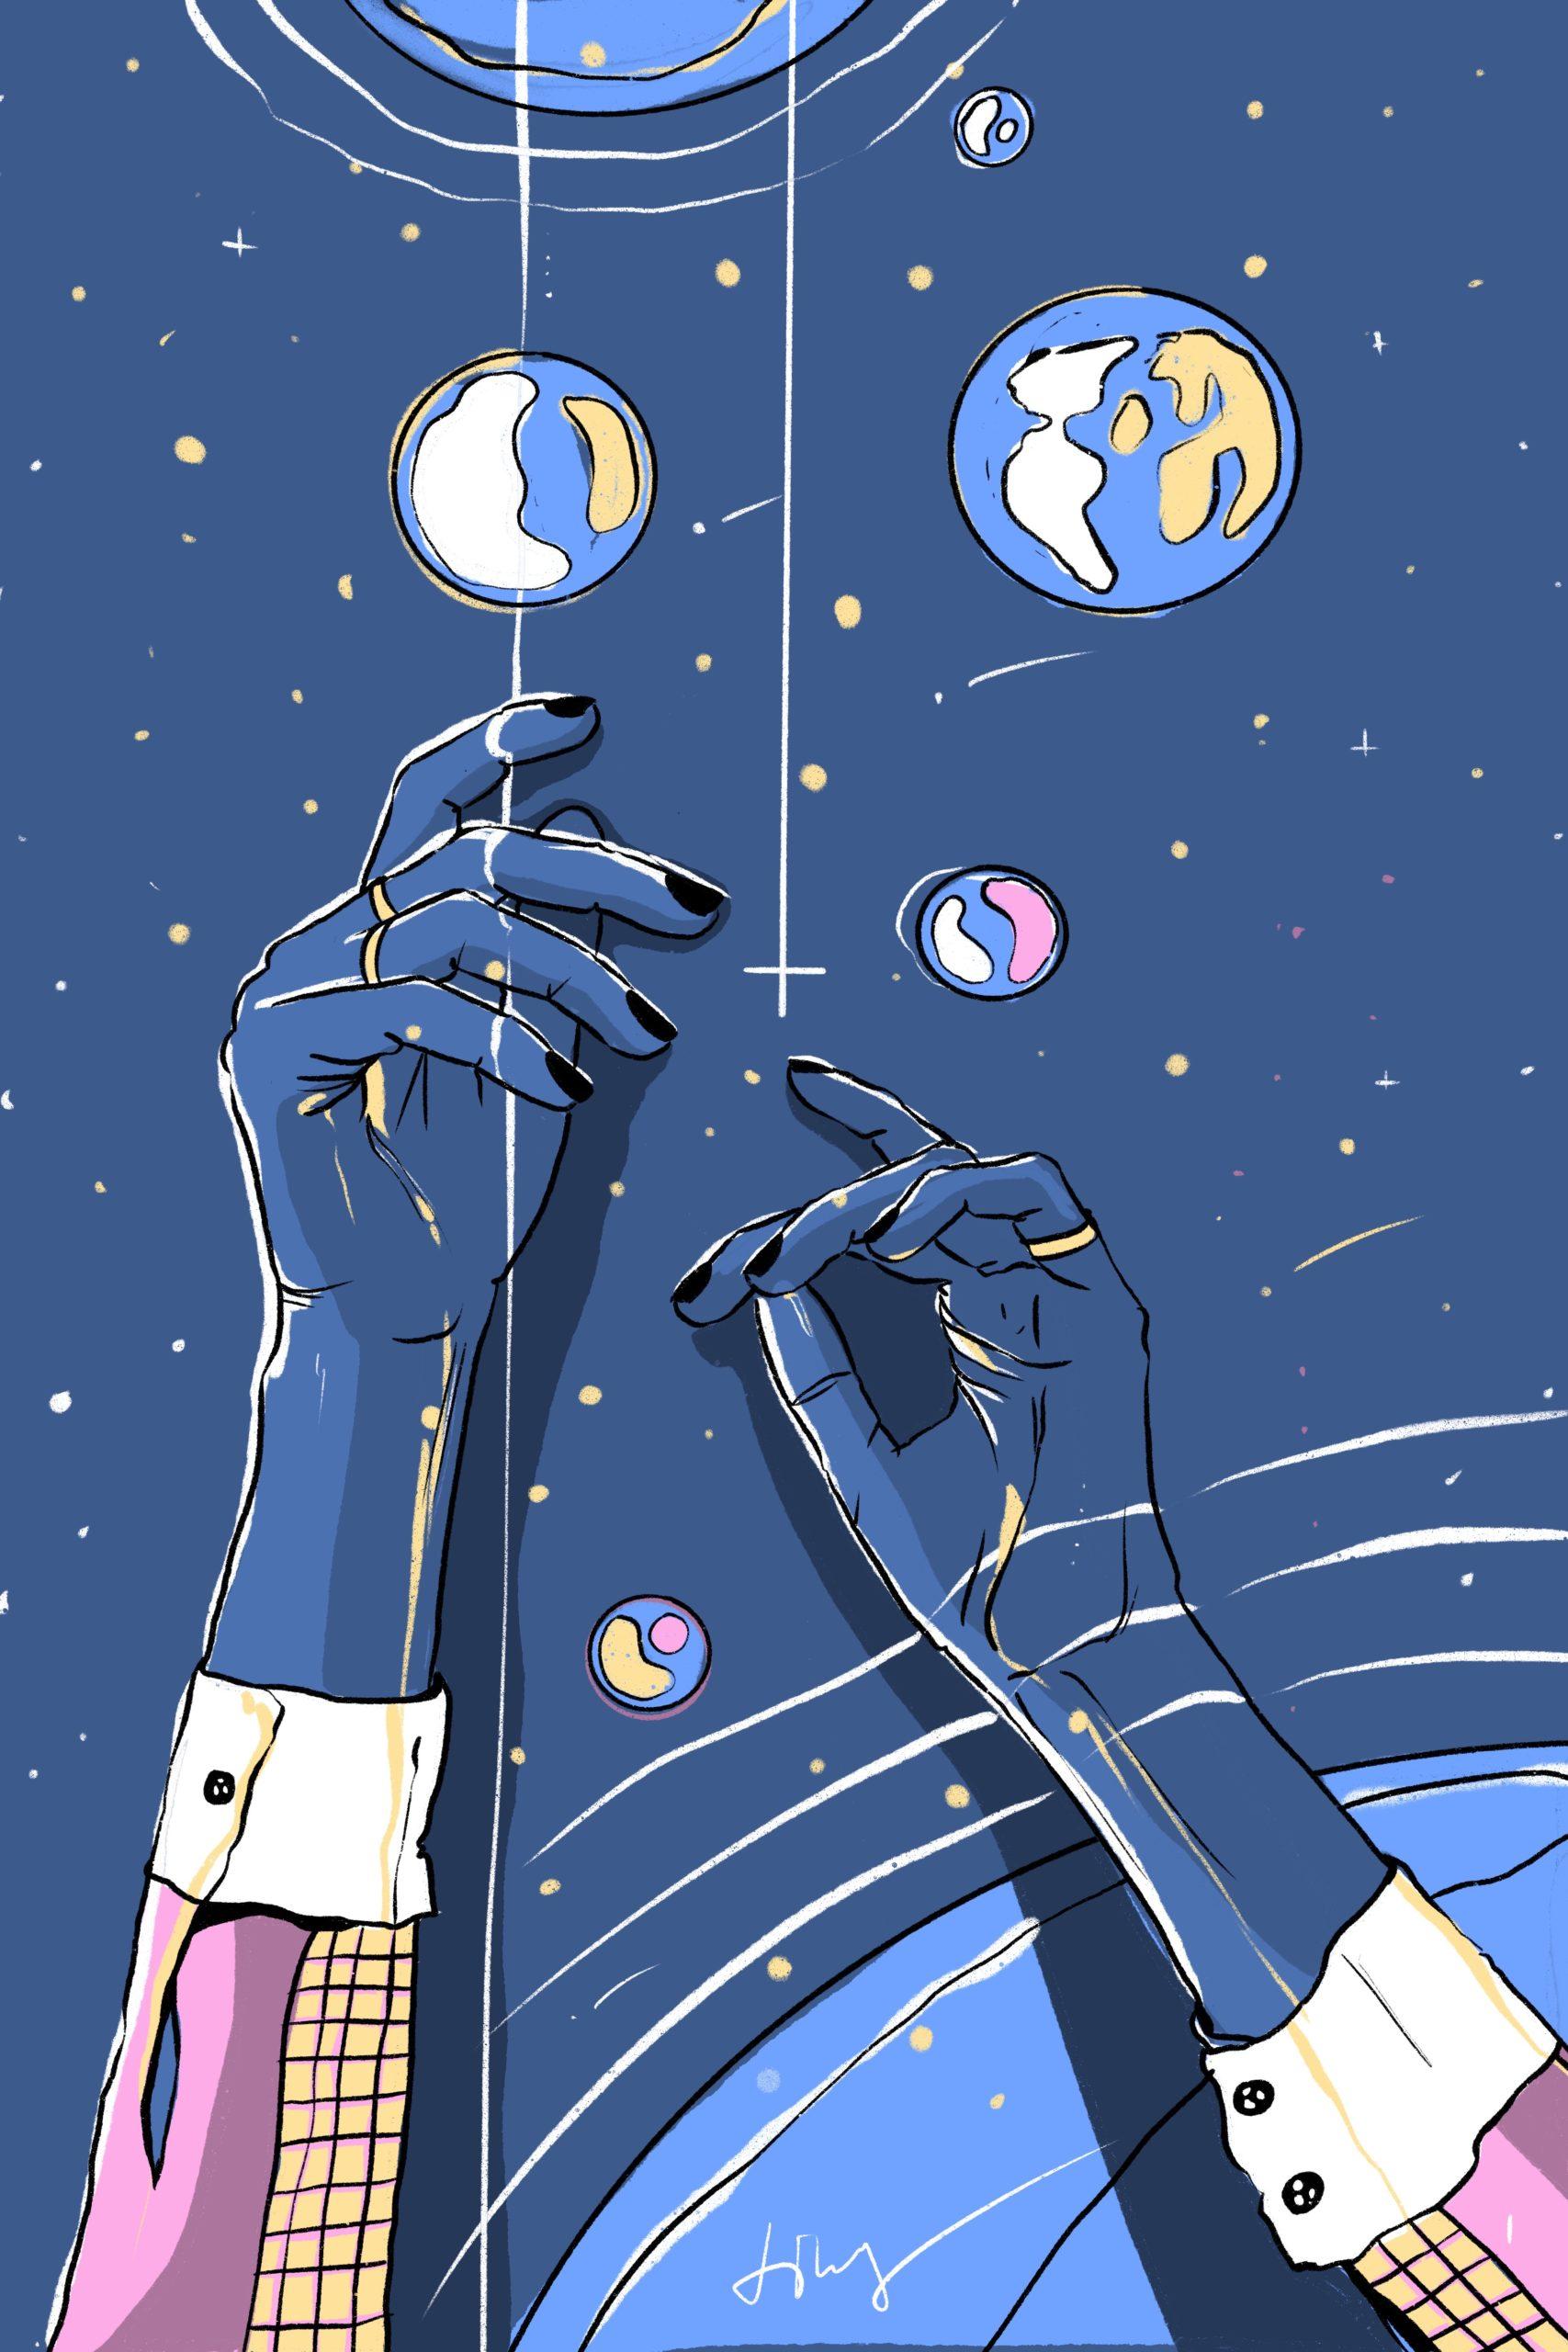 Illustration Digital Procreate Blue Universe Universum Melancholic Bubbles Erde Earth Stars Black Nail Varnish